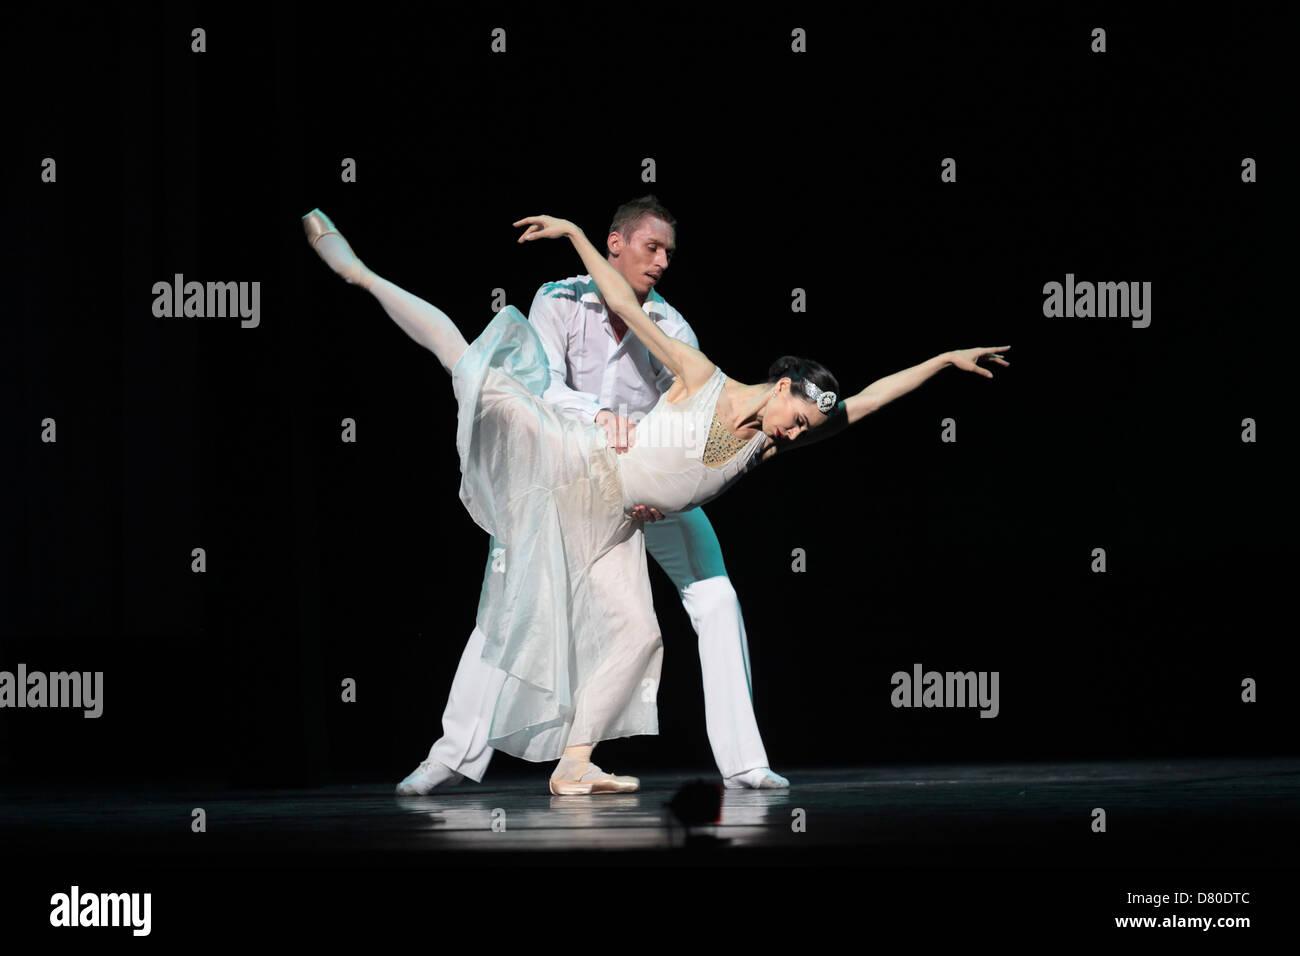 Cinderella, bringt das legendäre Mariinsky Ballet Charles Perraults klassischen Märchen zum Festival. Stockbild